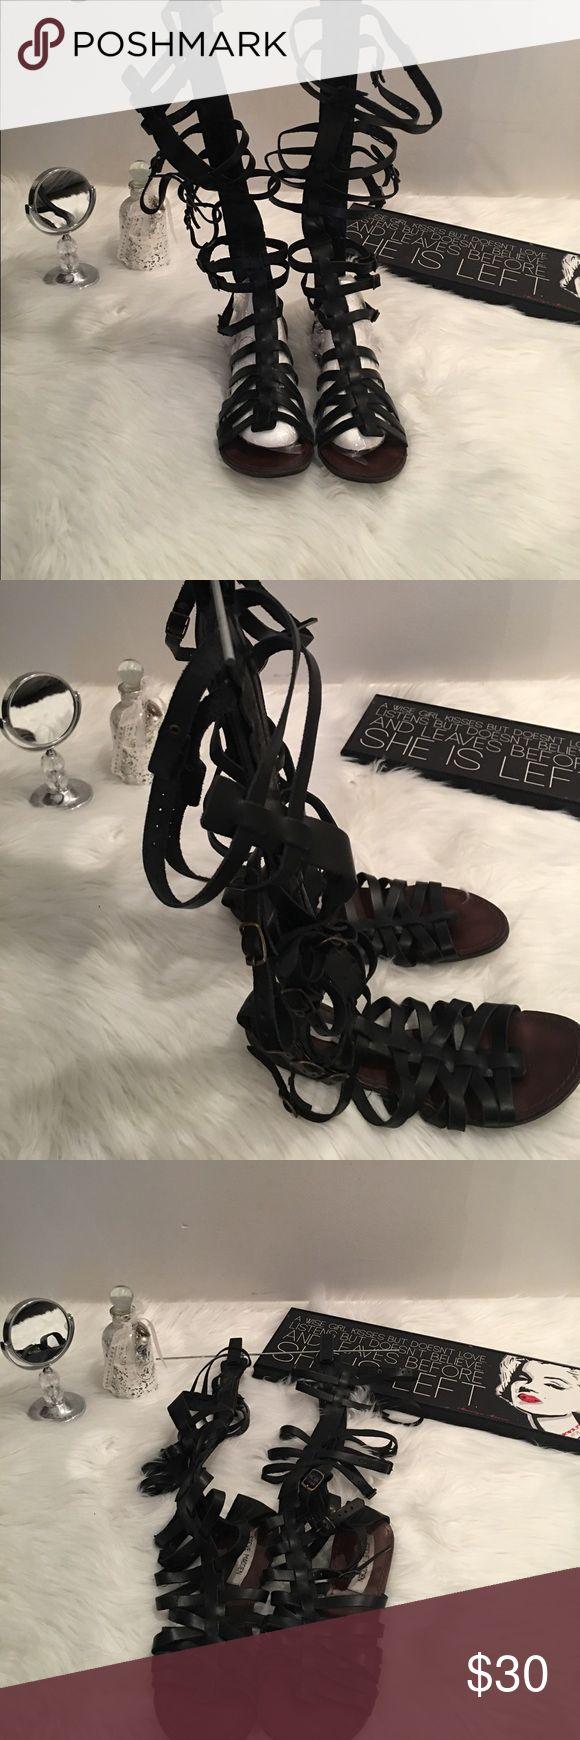 Steve Madden Gladiator Sandals Black Steve Madden Gladiator Sandals. Great Condition. Looks good with any outfit. Steve Madden Shoes Sandals